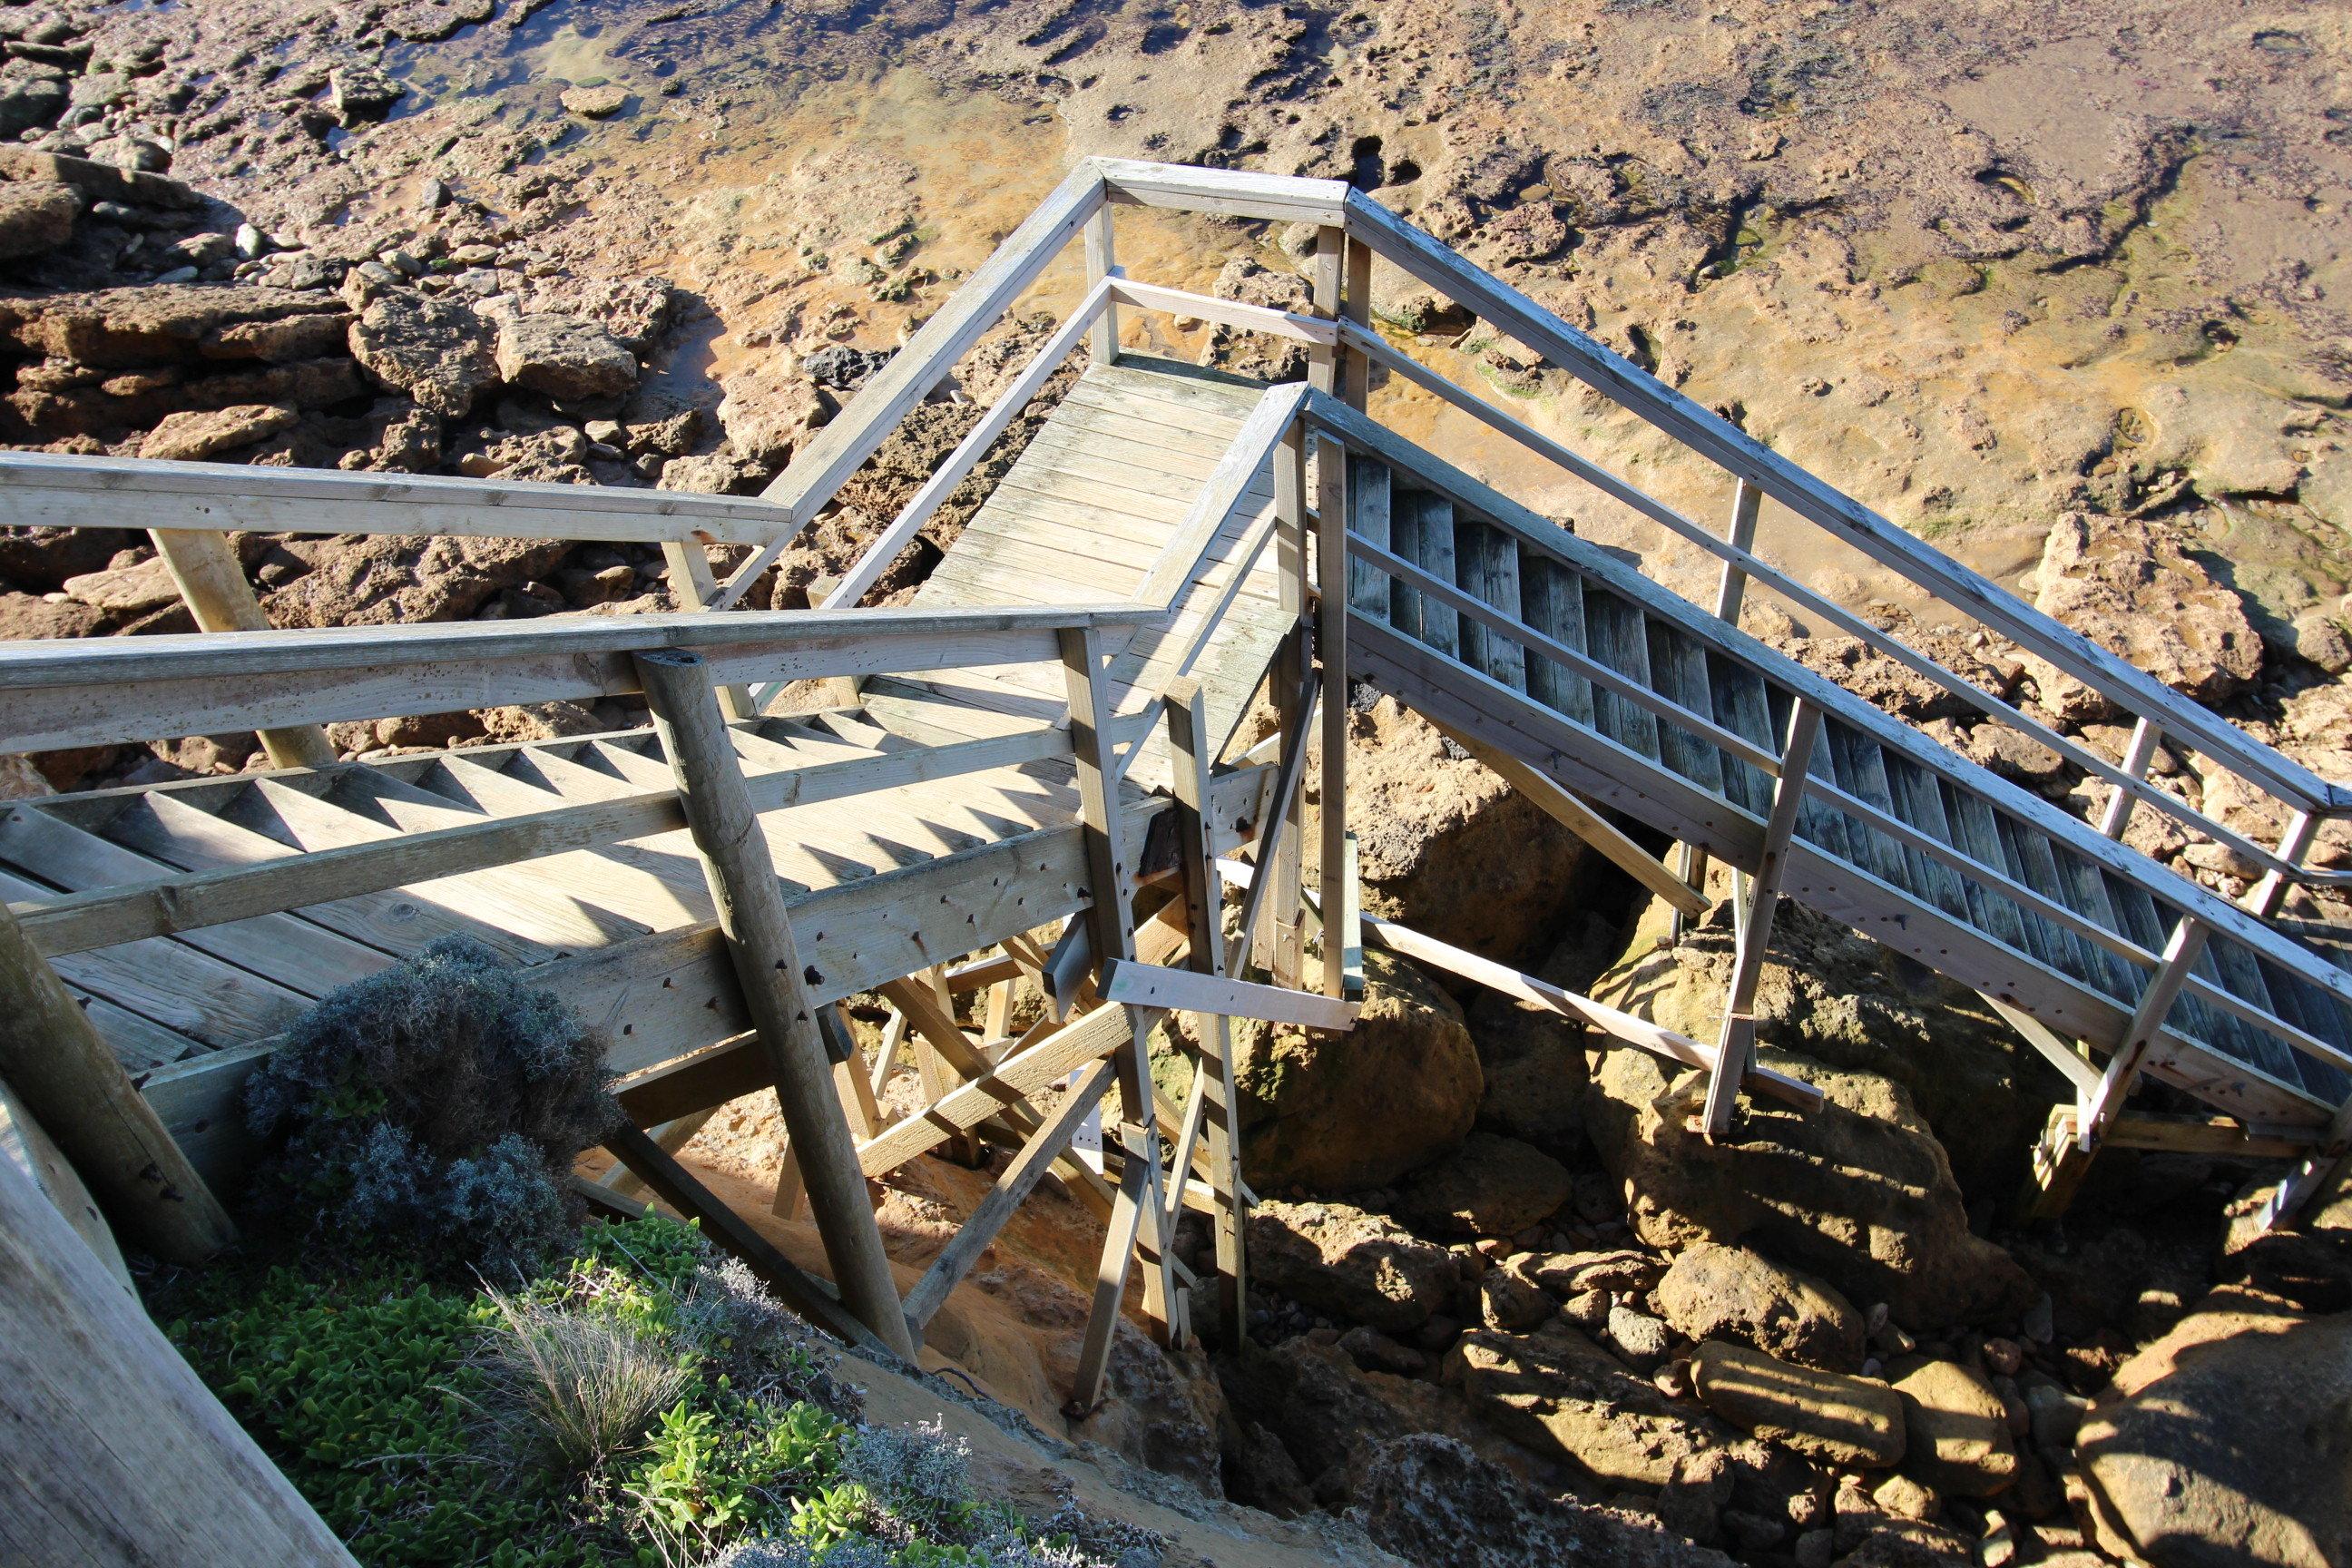 Steps access stair replacement - Jan Juc - Great Ocean Road